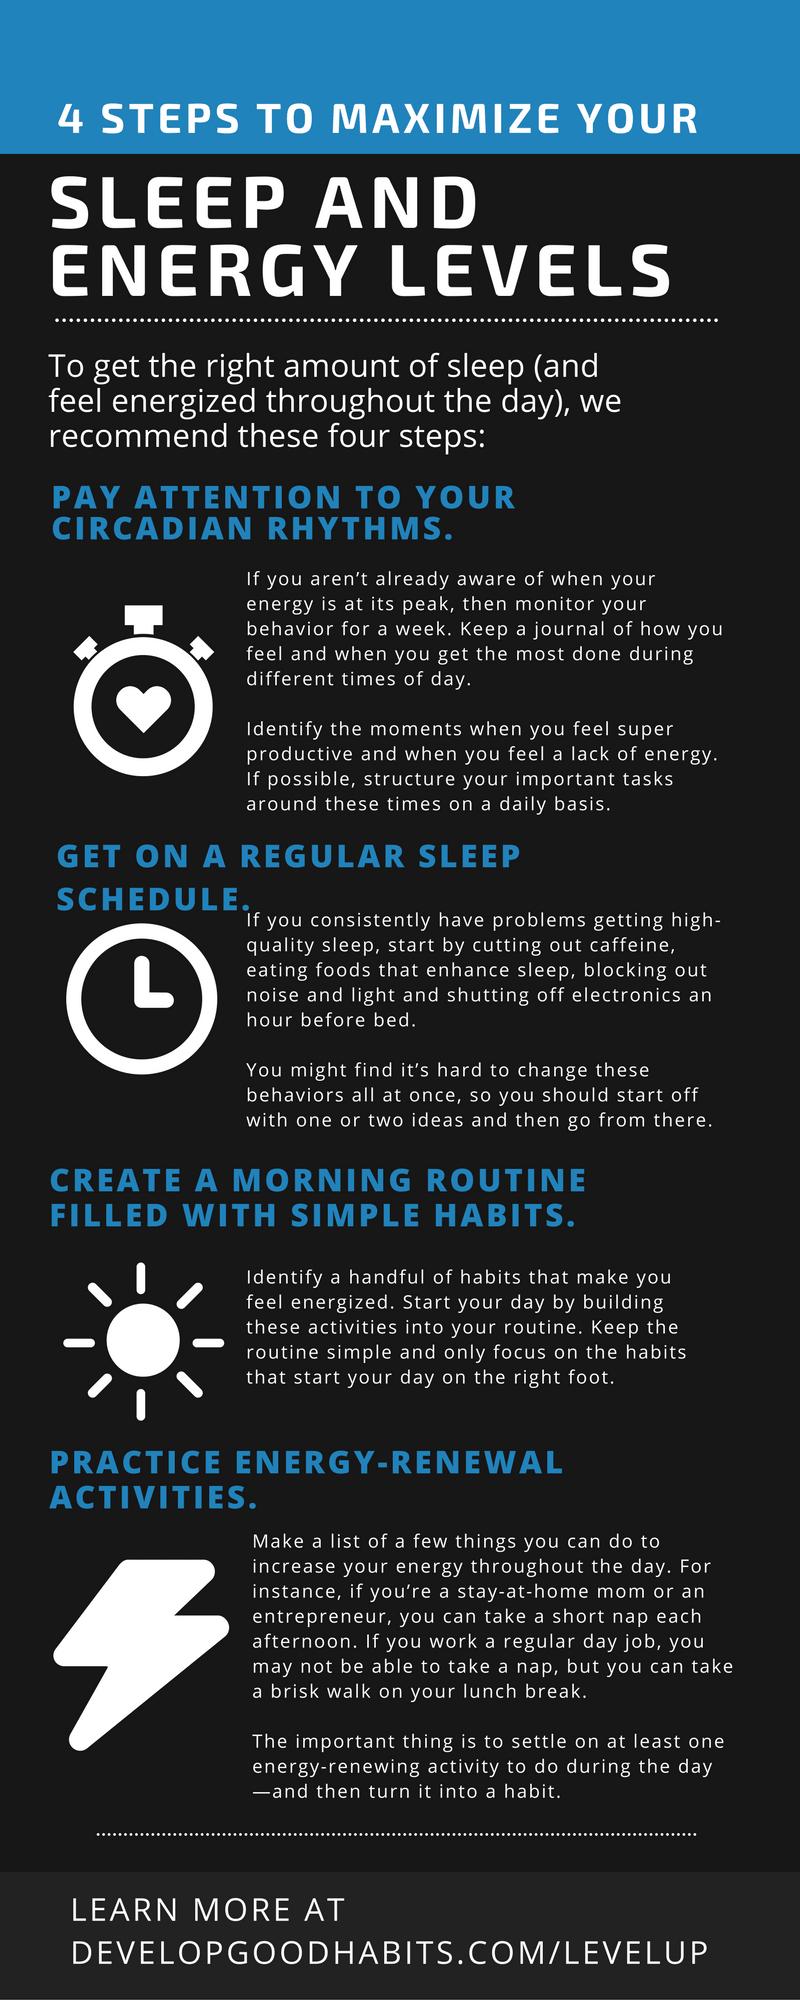 Watch Tips For Better Sleep: 4 Daytime Habits That Ruin Sleep video